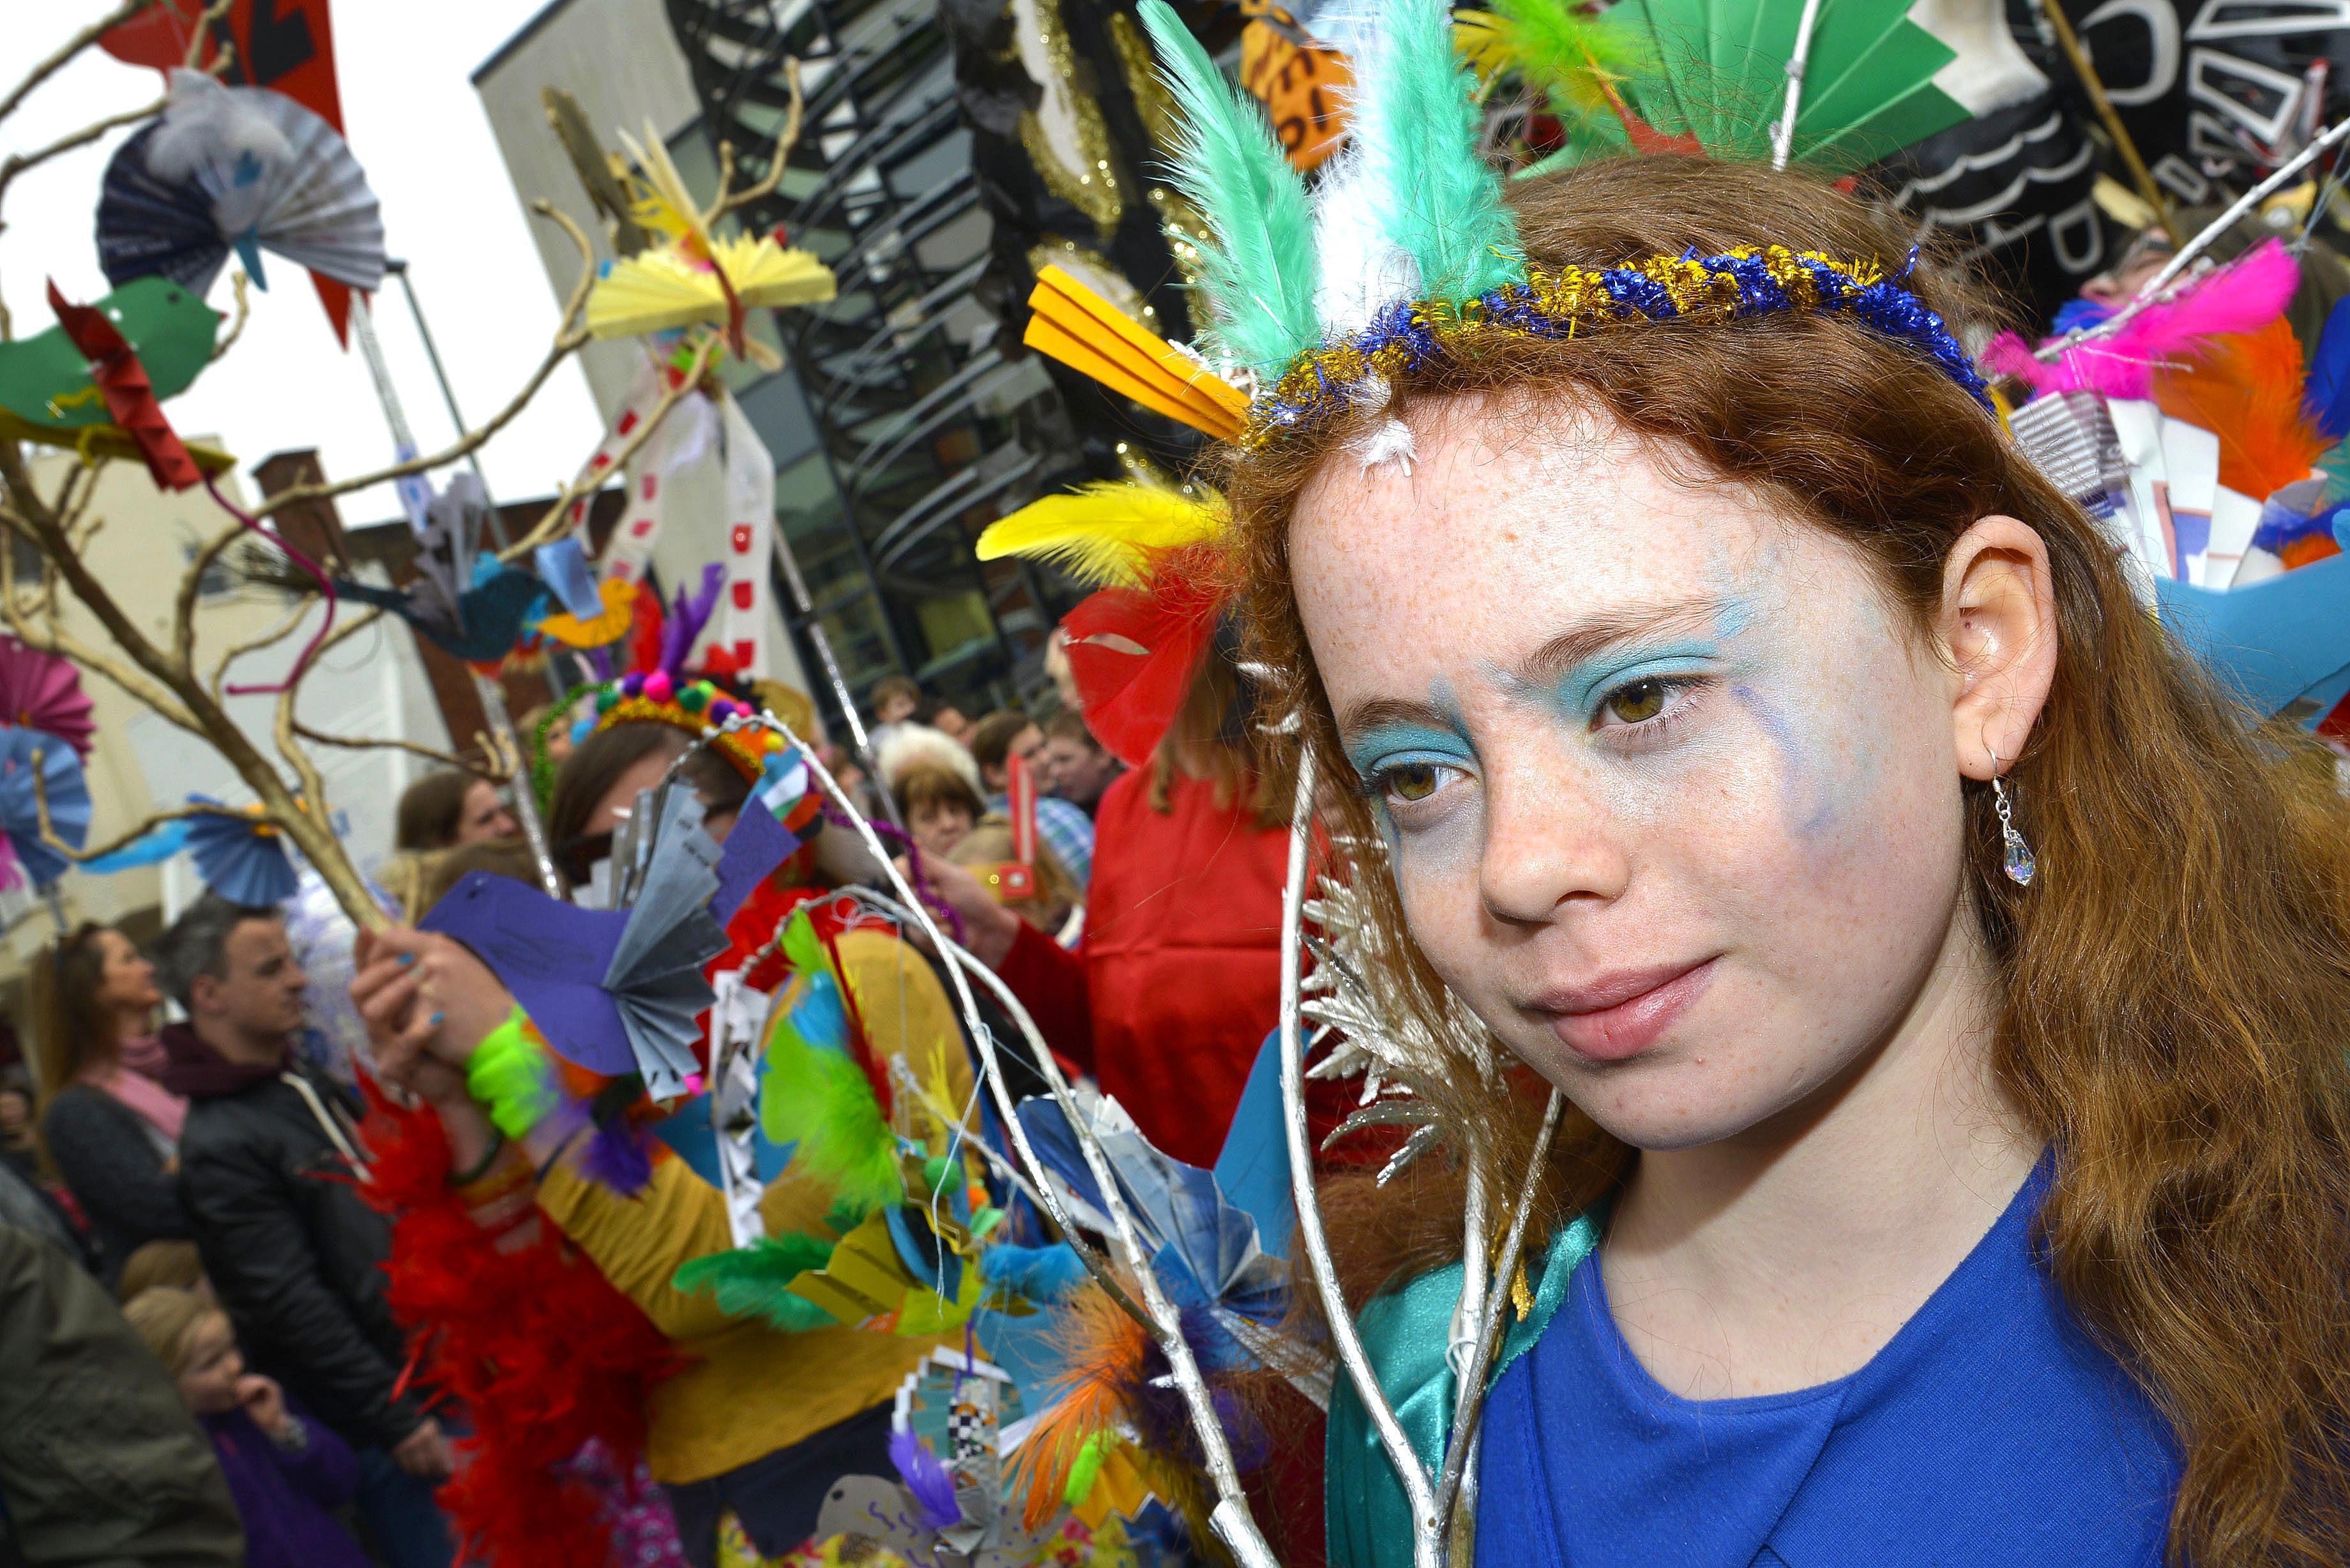 Children's Parade 2015